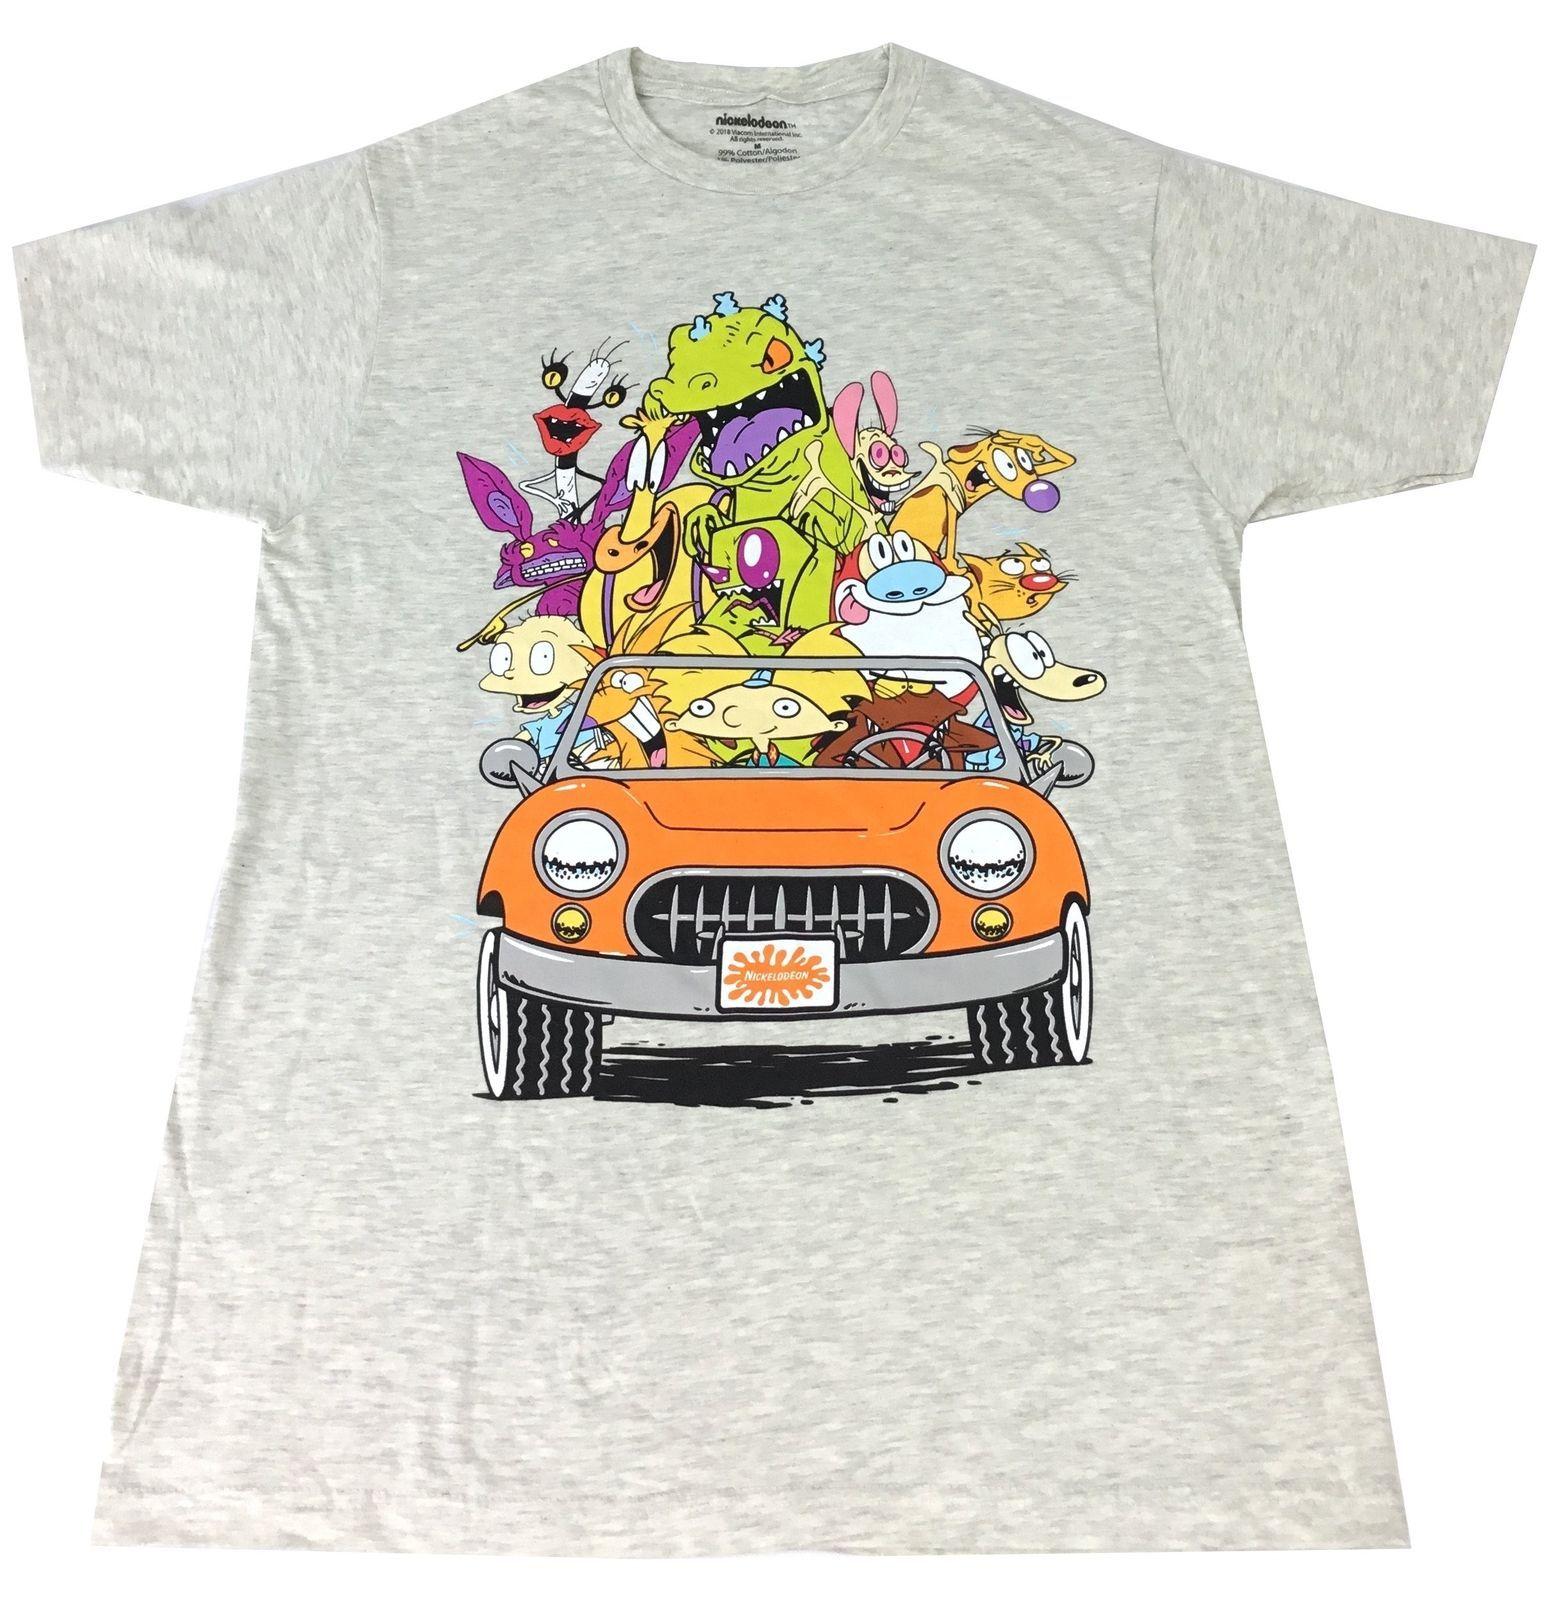 69b24f3f0ff Nick Nickelodeon 90s Characters Throwbakc Shirt Mens Adult Medium Mens 2018  Fashion Brand T Shirt O Neck 100%cotton T Shirt Tops Tee Formal Shirts  Denim ...